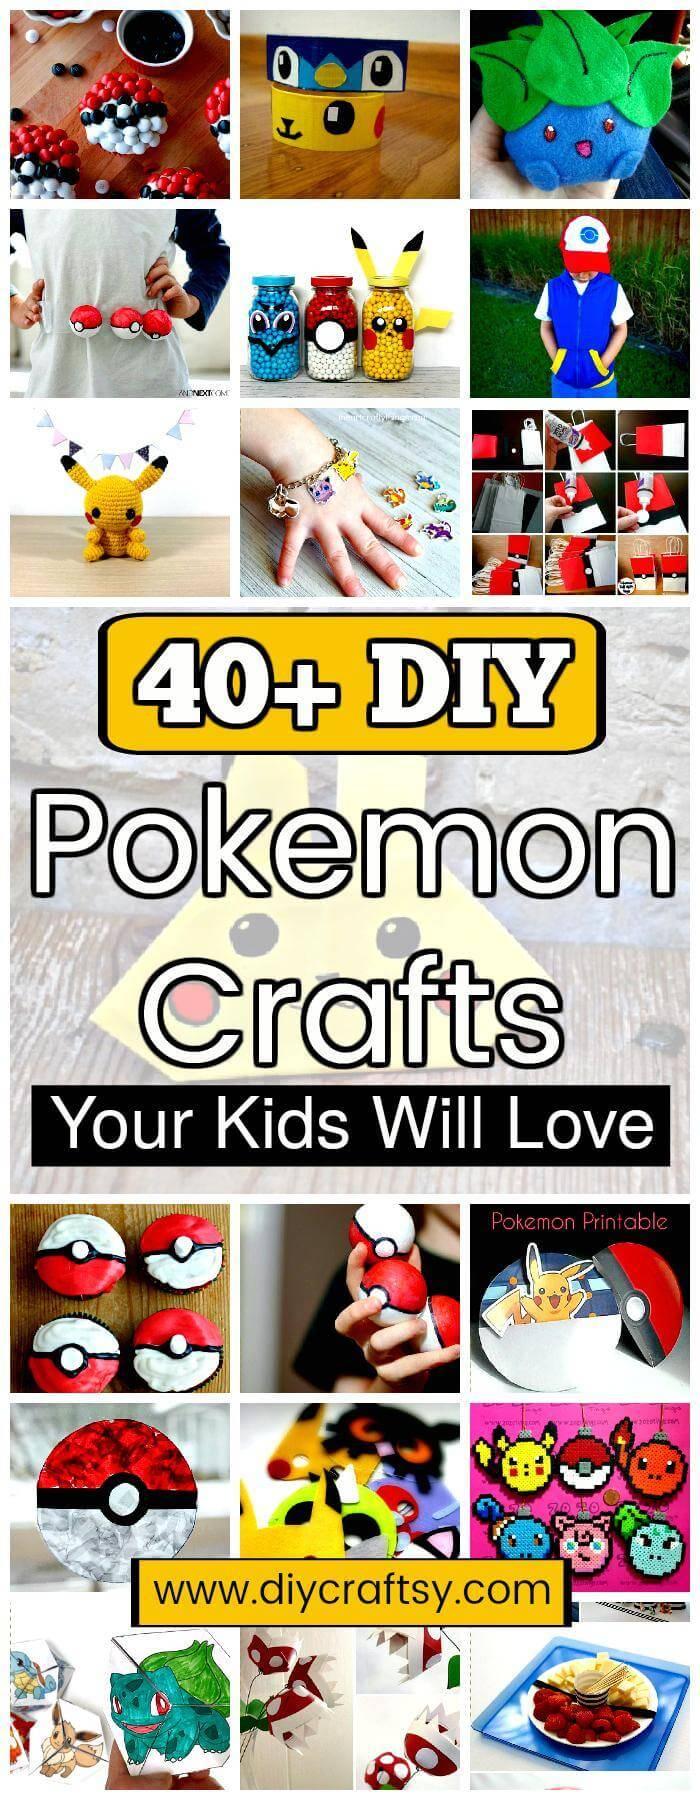 DIY Pokemon Crafts